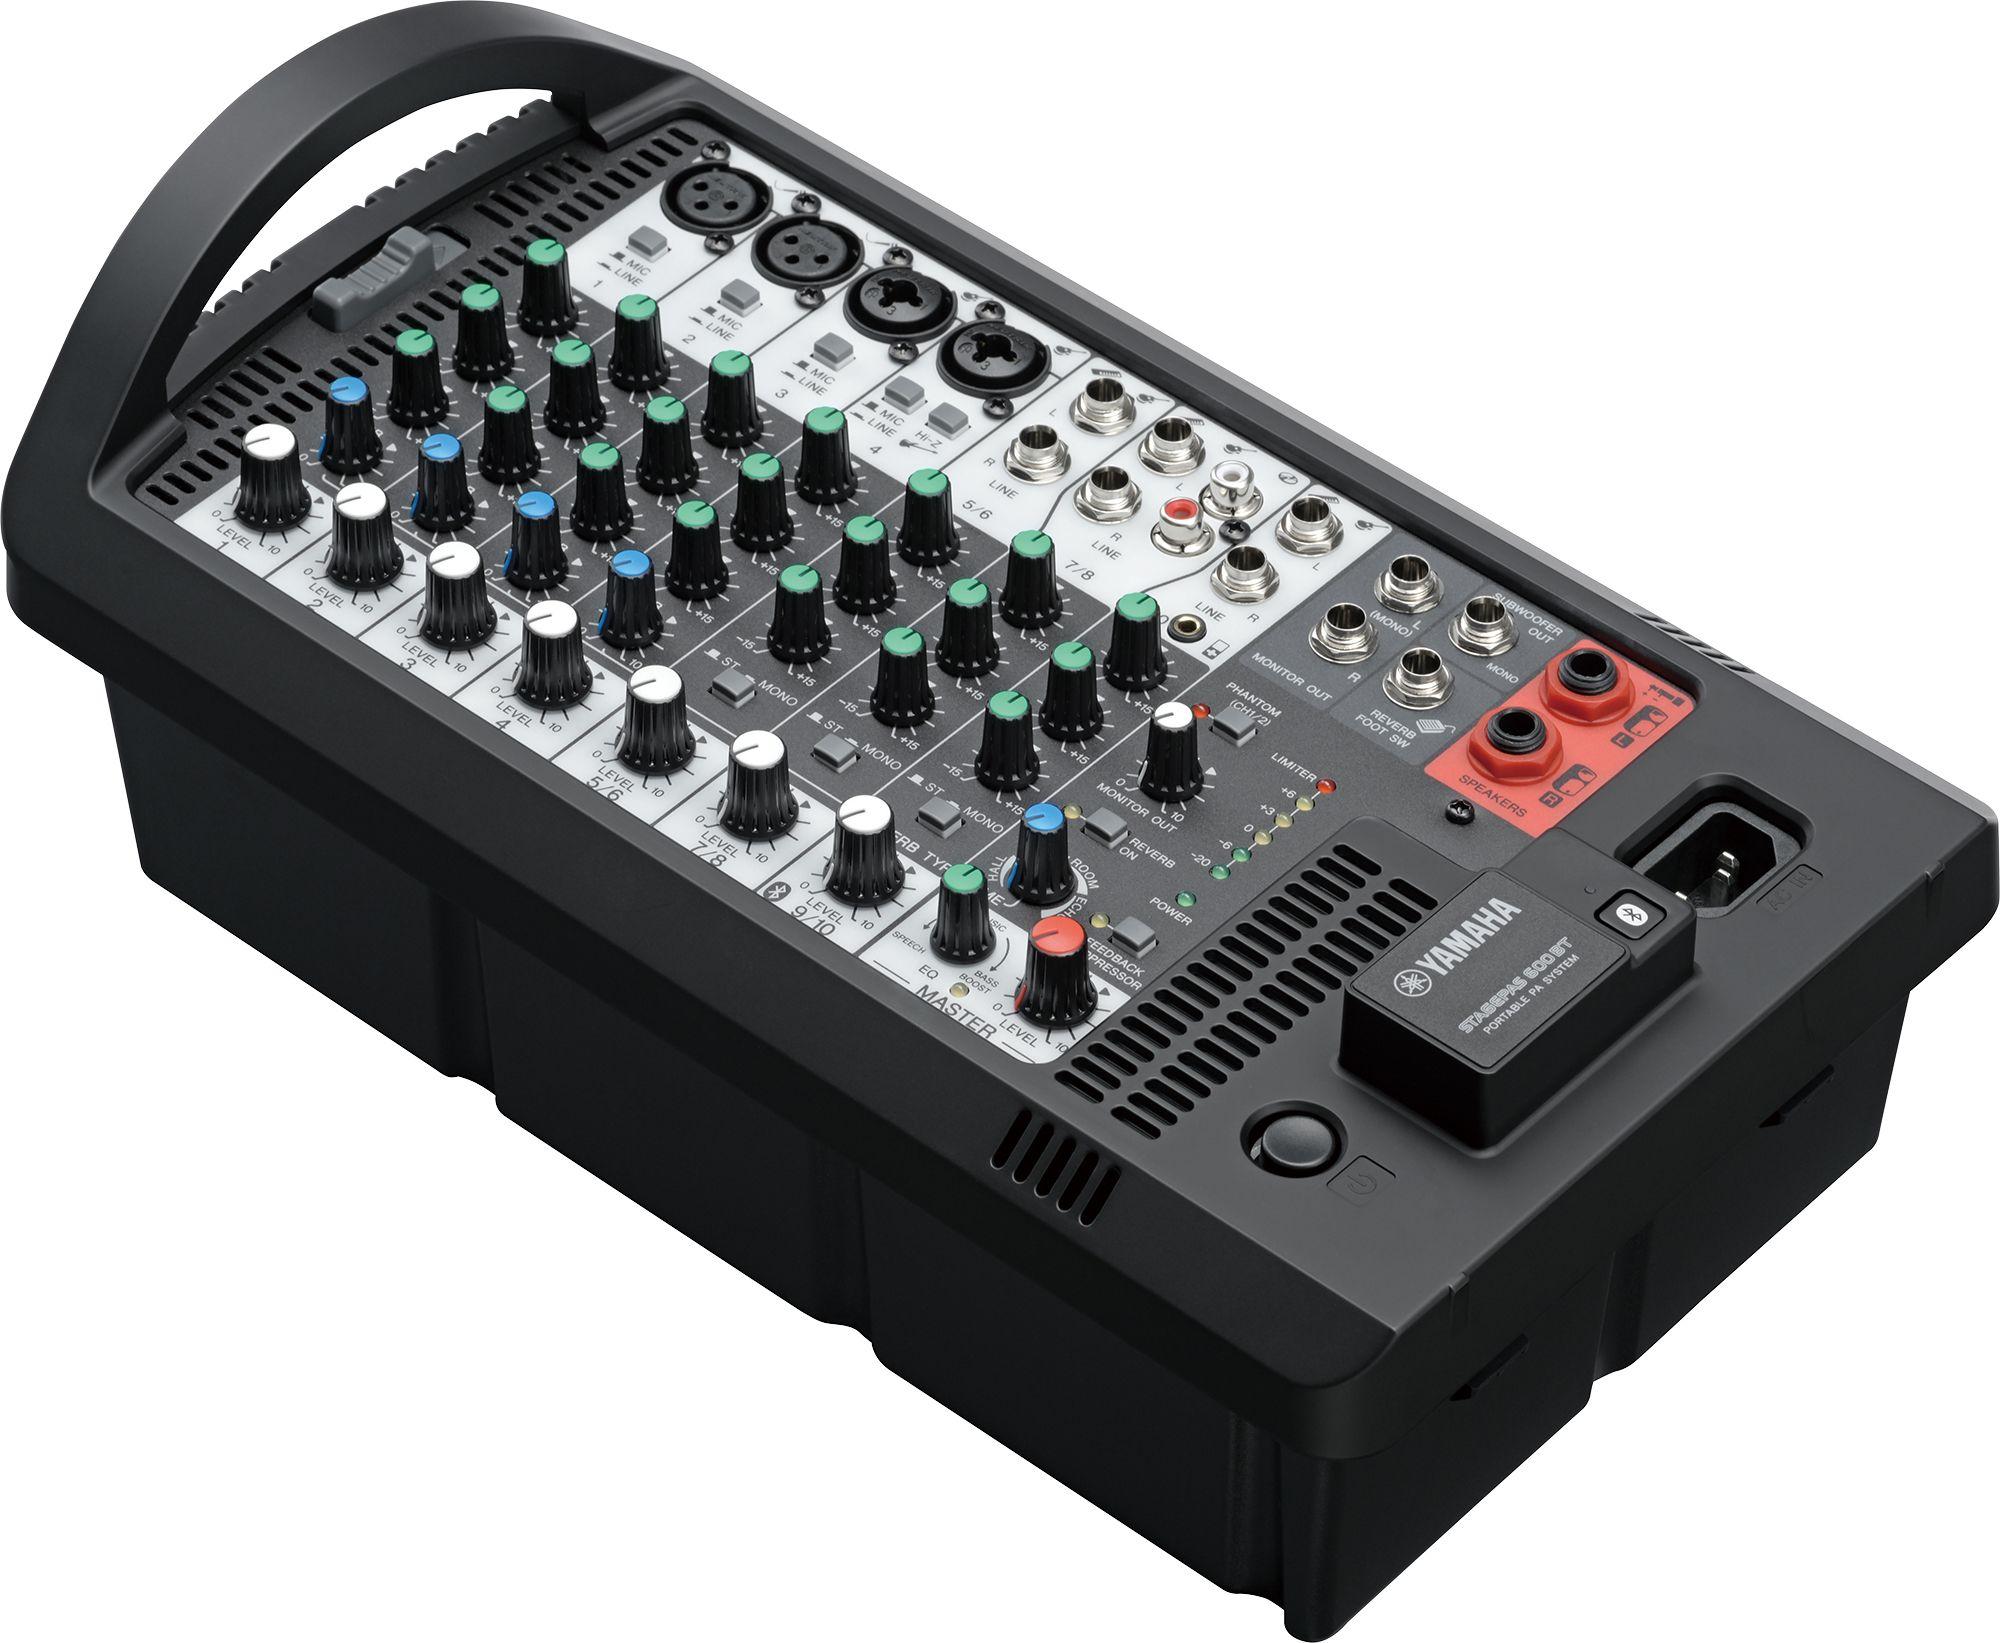 stagepas600bt-mixer-side-2000x1643-4068383fc39f2a91d4104bbd666bb7b0.jpg